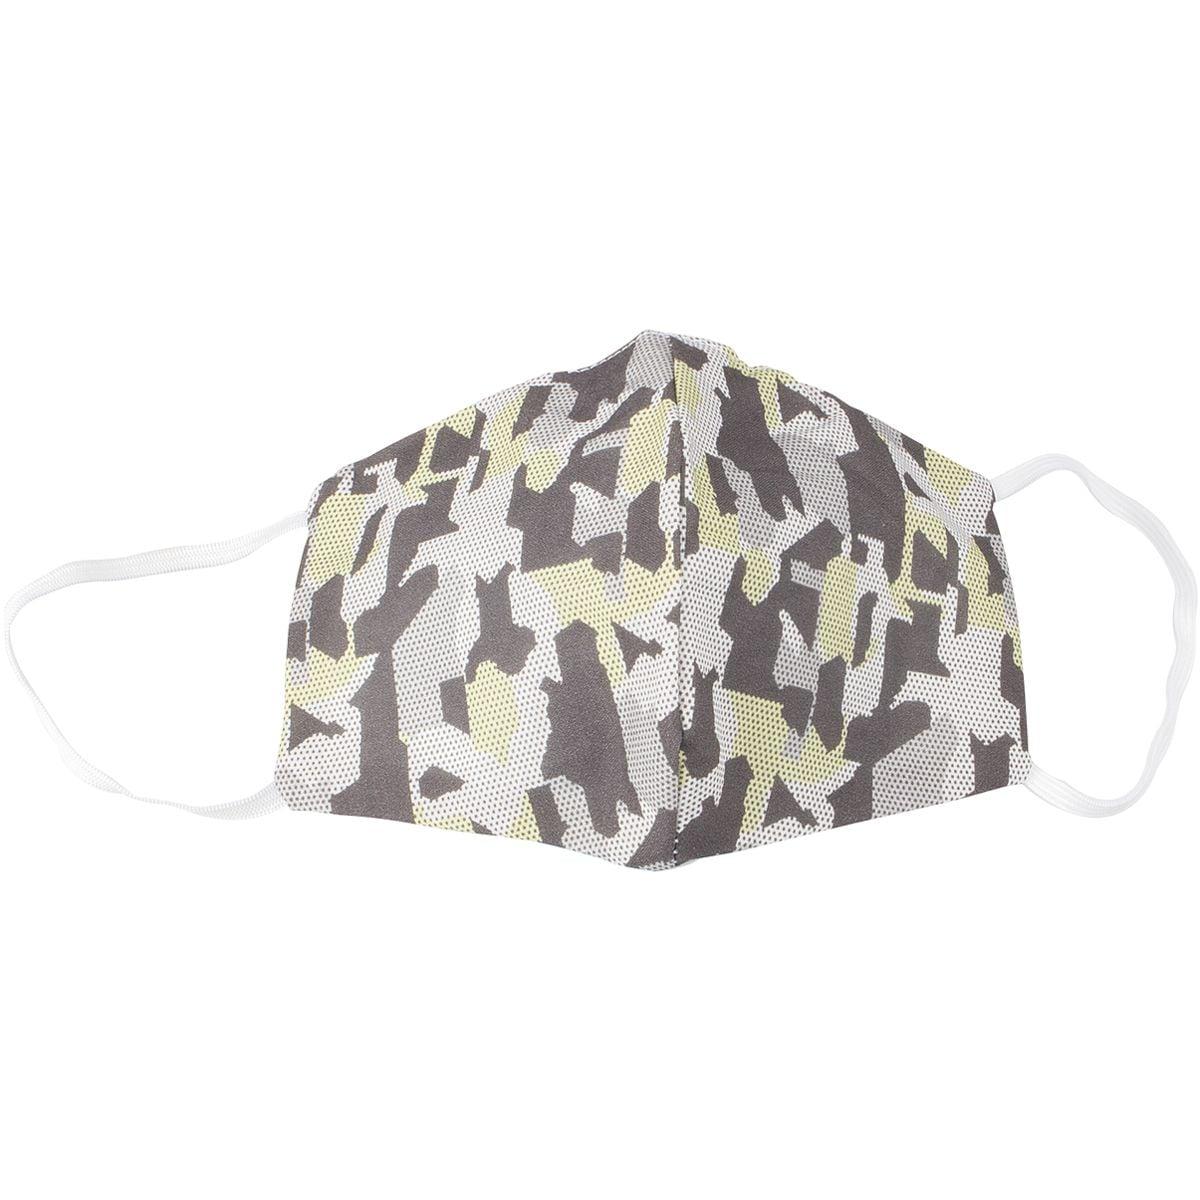 Pak met 5 wasbare mond-neus-maskers »Army Green«, herenmaat